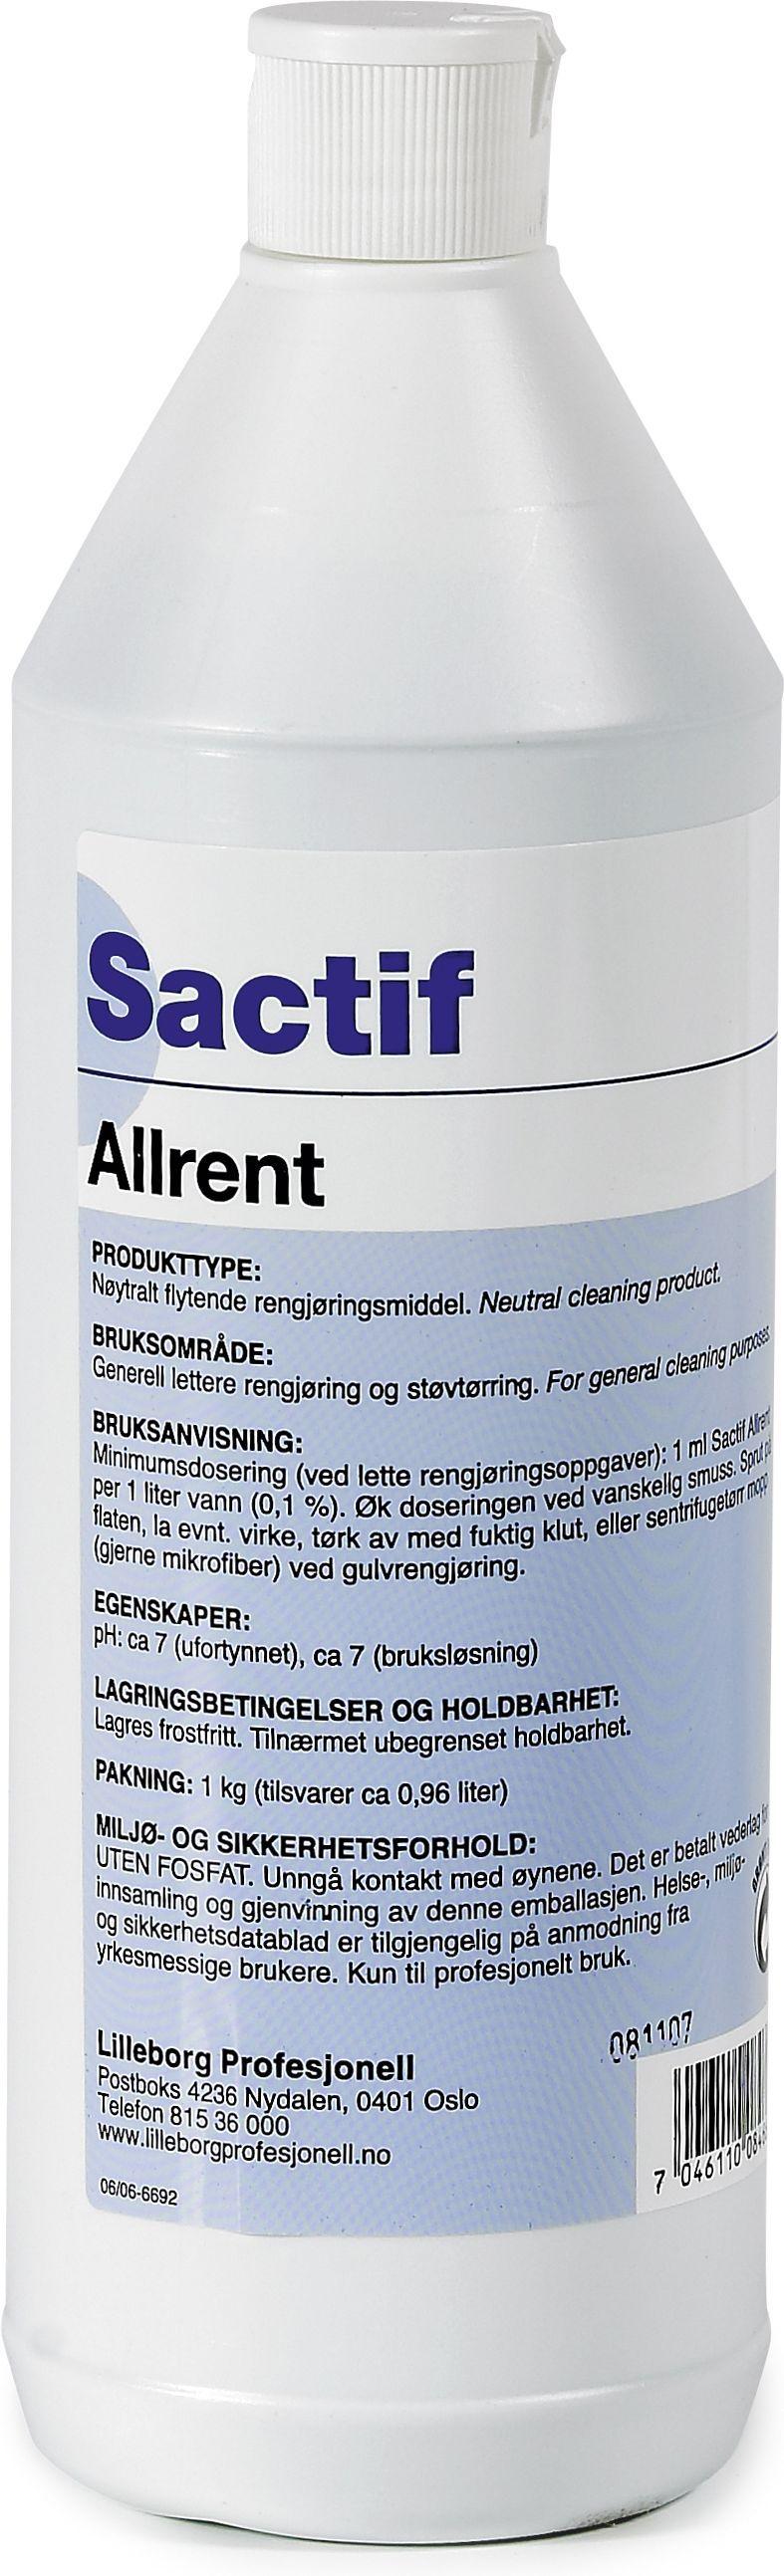 Sactif Rengjøring Allrent 1L Y444392